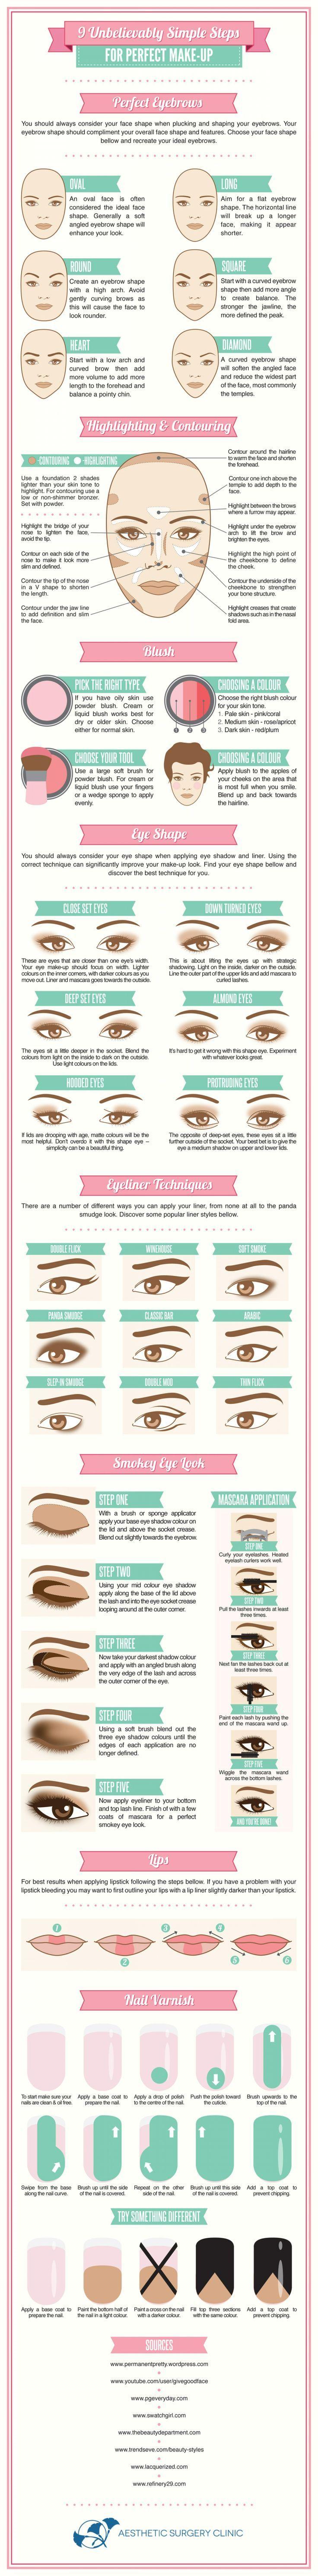 http://makeupit.com/Zykrd   Don't let sensitive skin stop you from applying makeup!